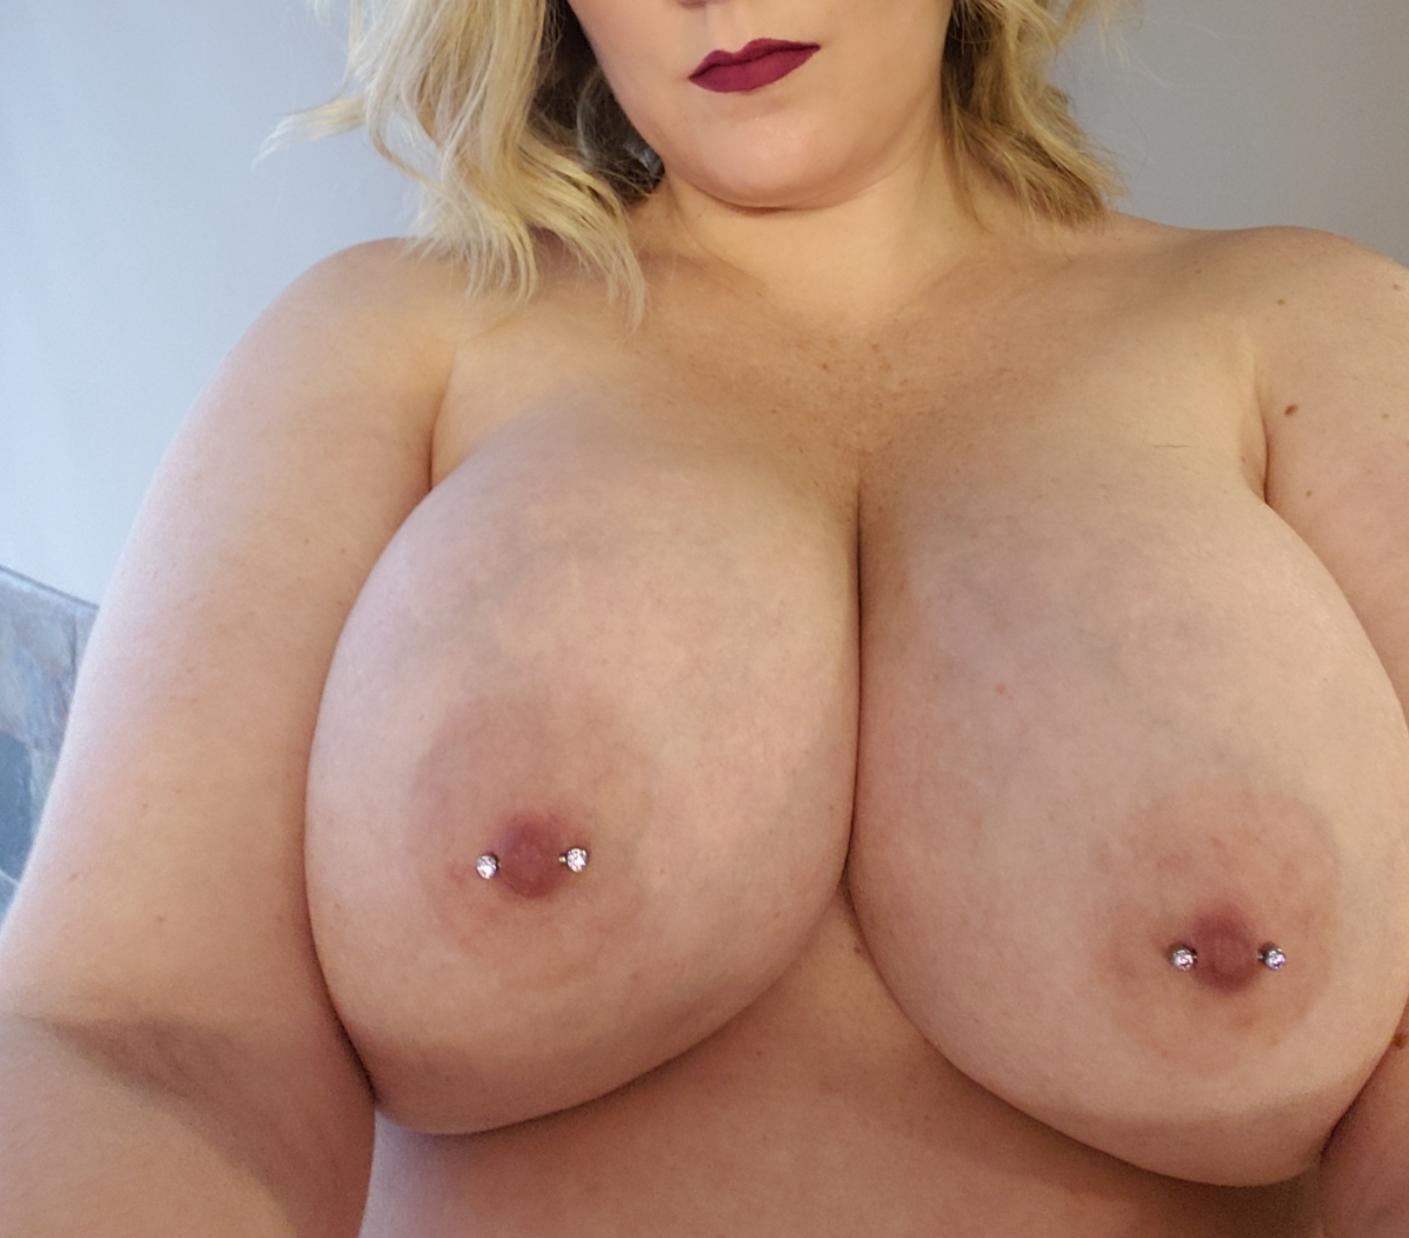 Perkiest boobs ever pics